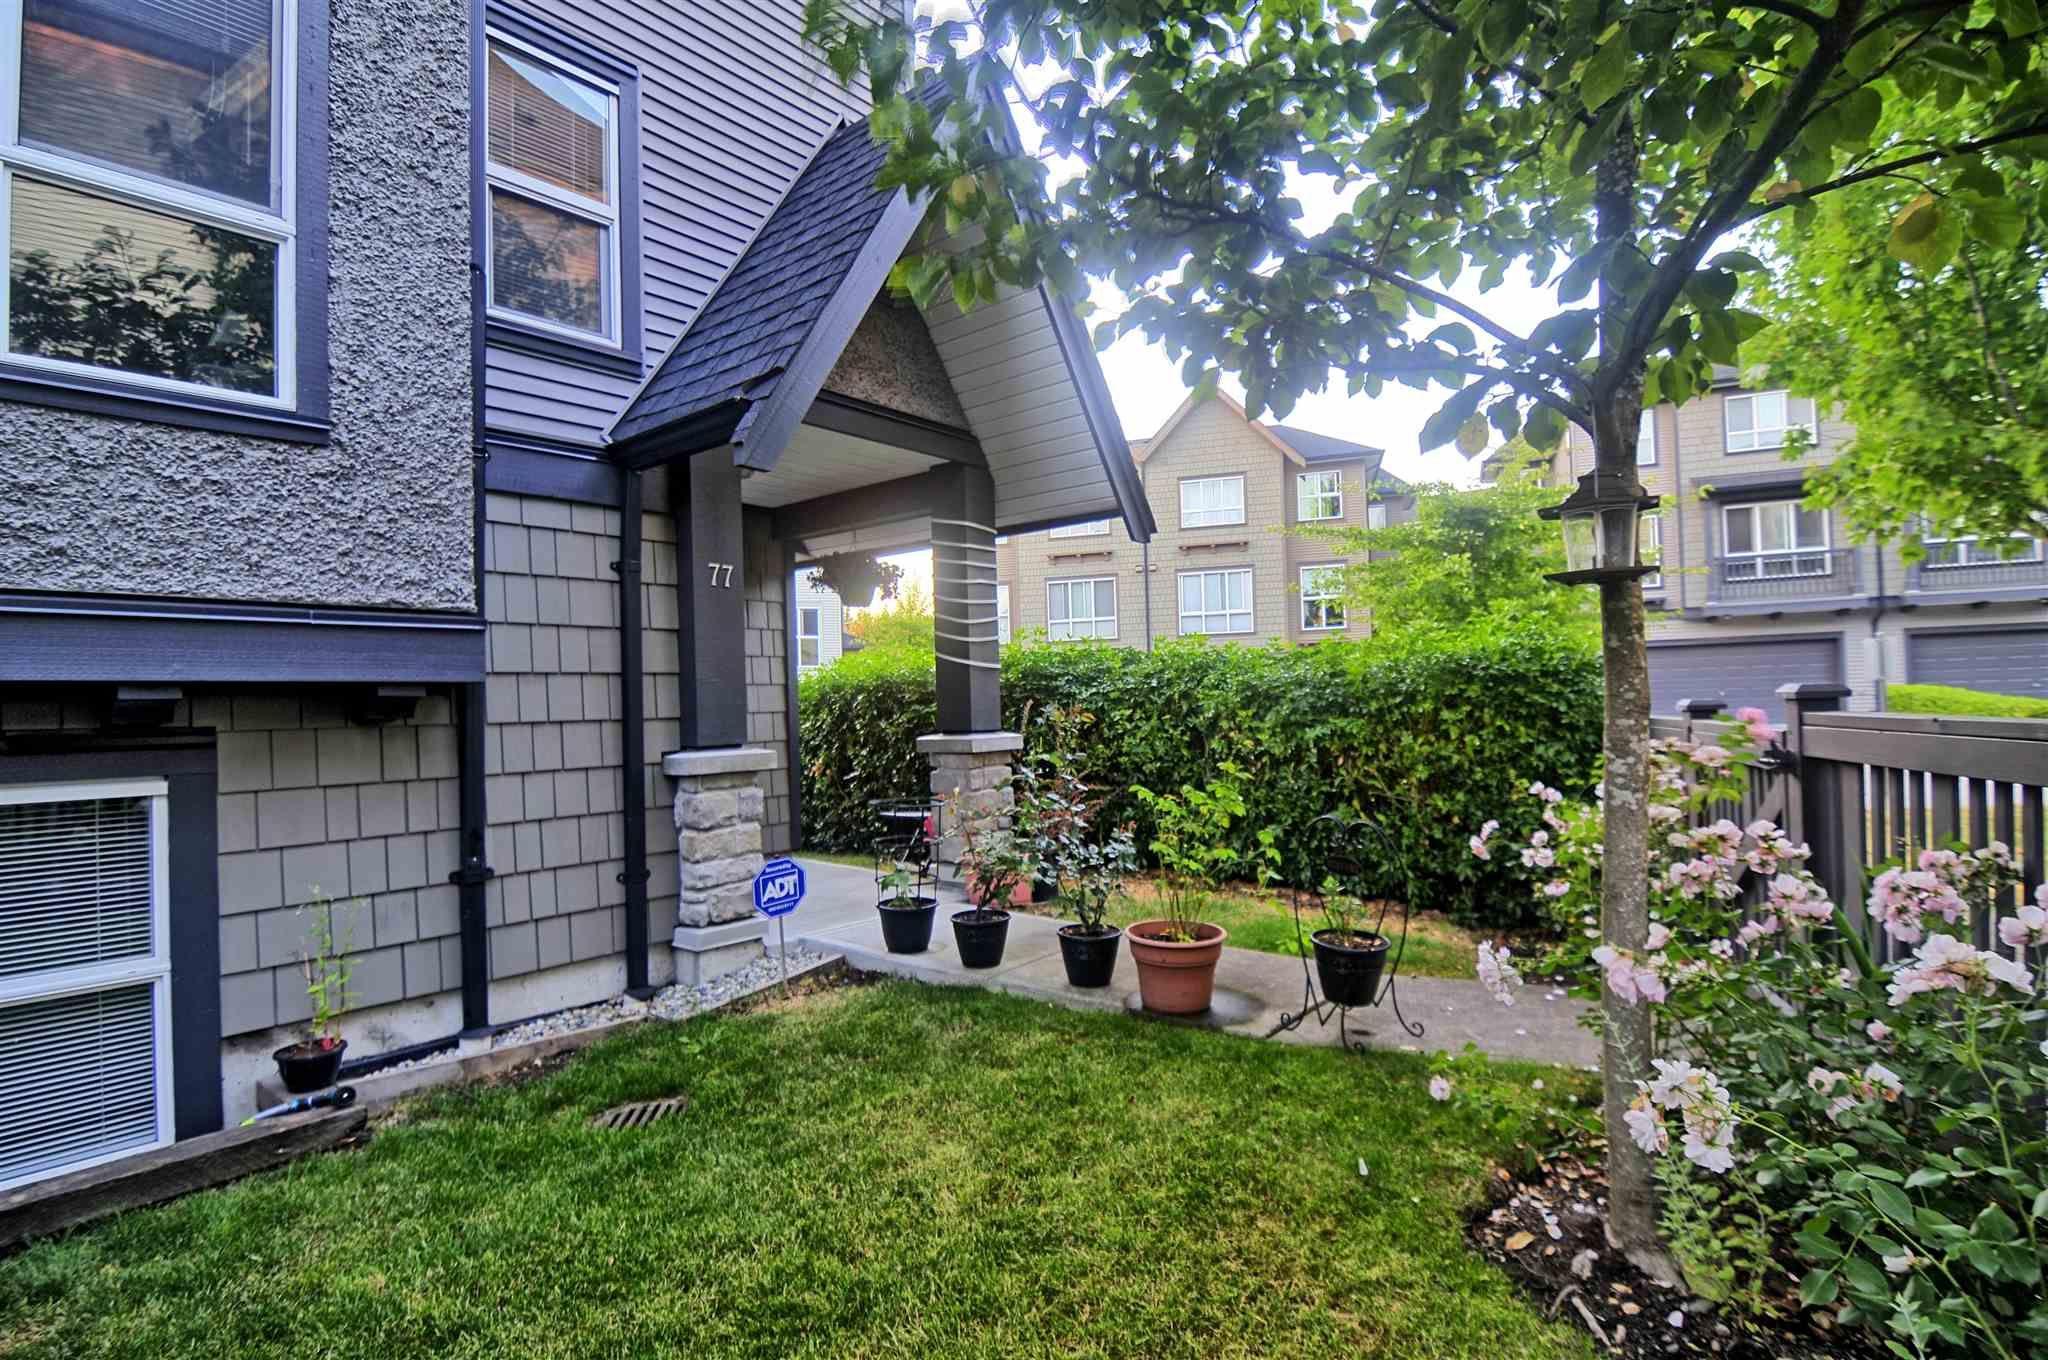 Main Photo: 77 10489 DELSOM Crescent in Delta: Nordel Townhouse for sale (N. Delta)  : MLS®# R2601476